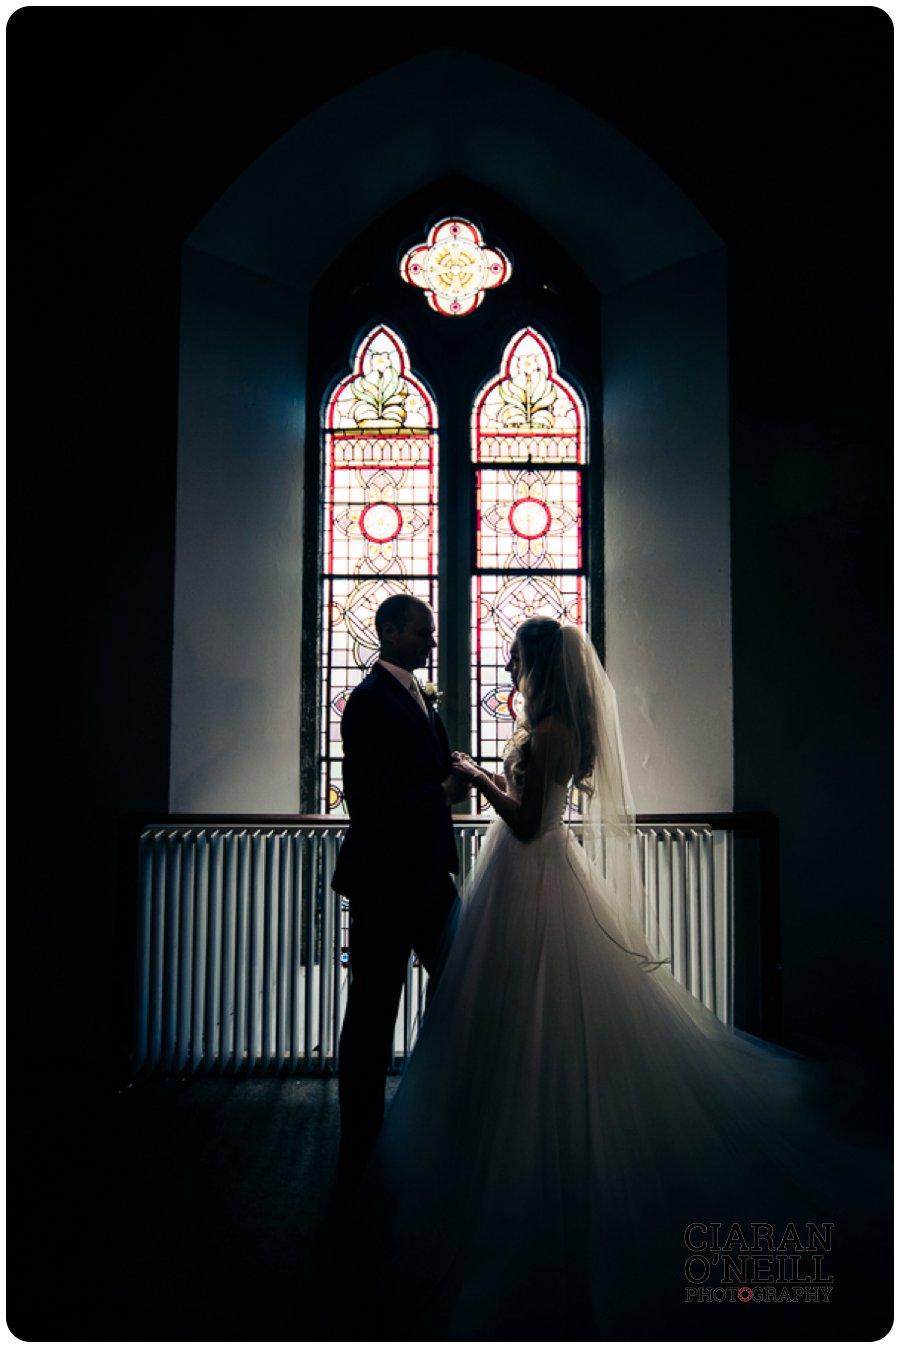 Linda & Jae's wedding at the Merchant Hotel by Ciaran O'Neill Photography 12